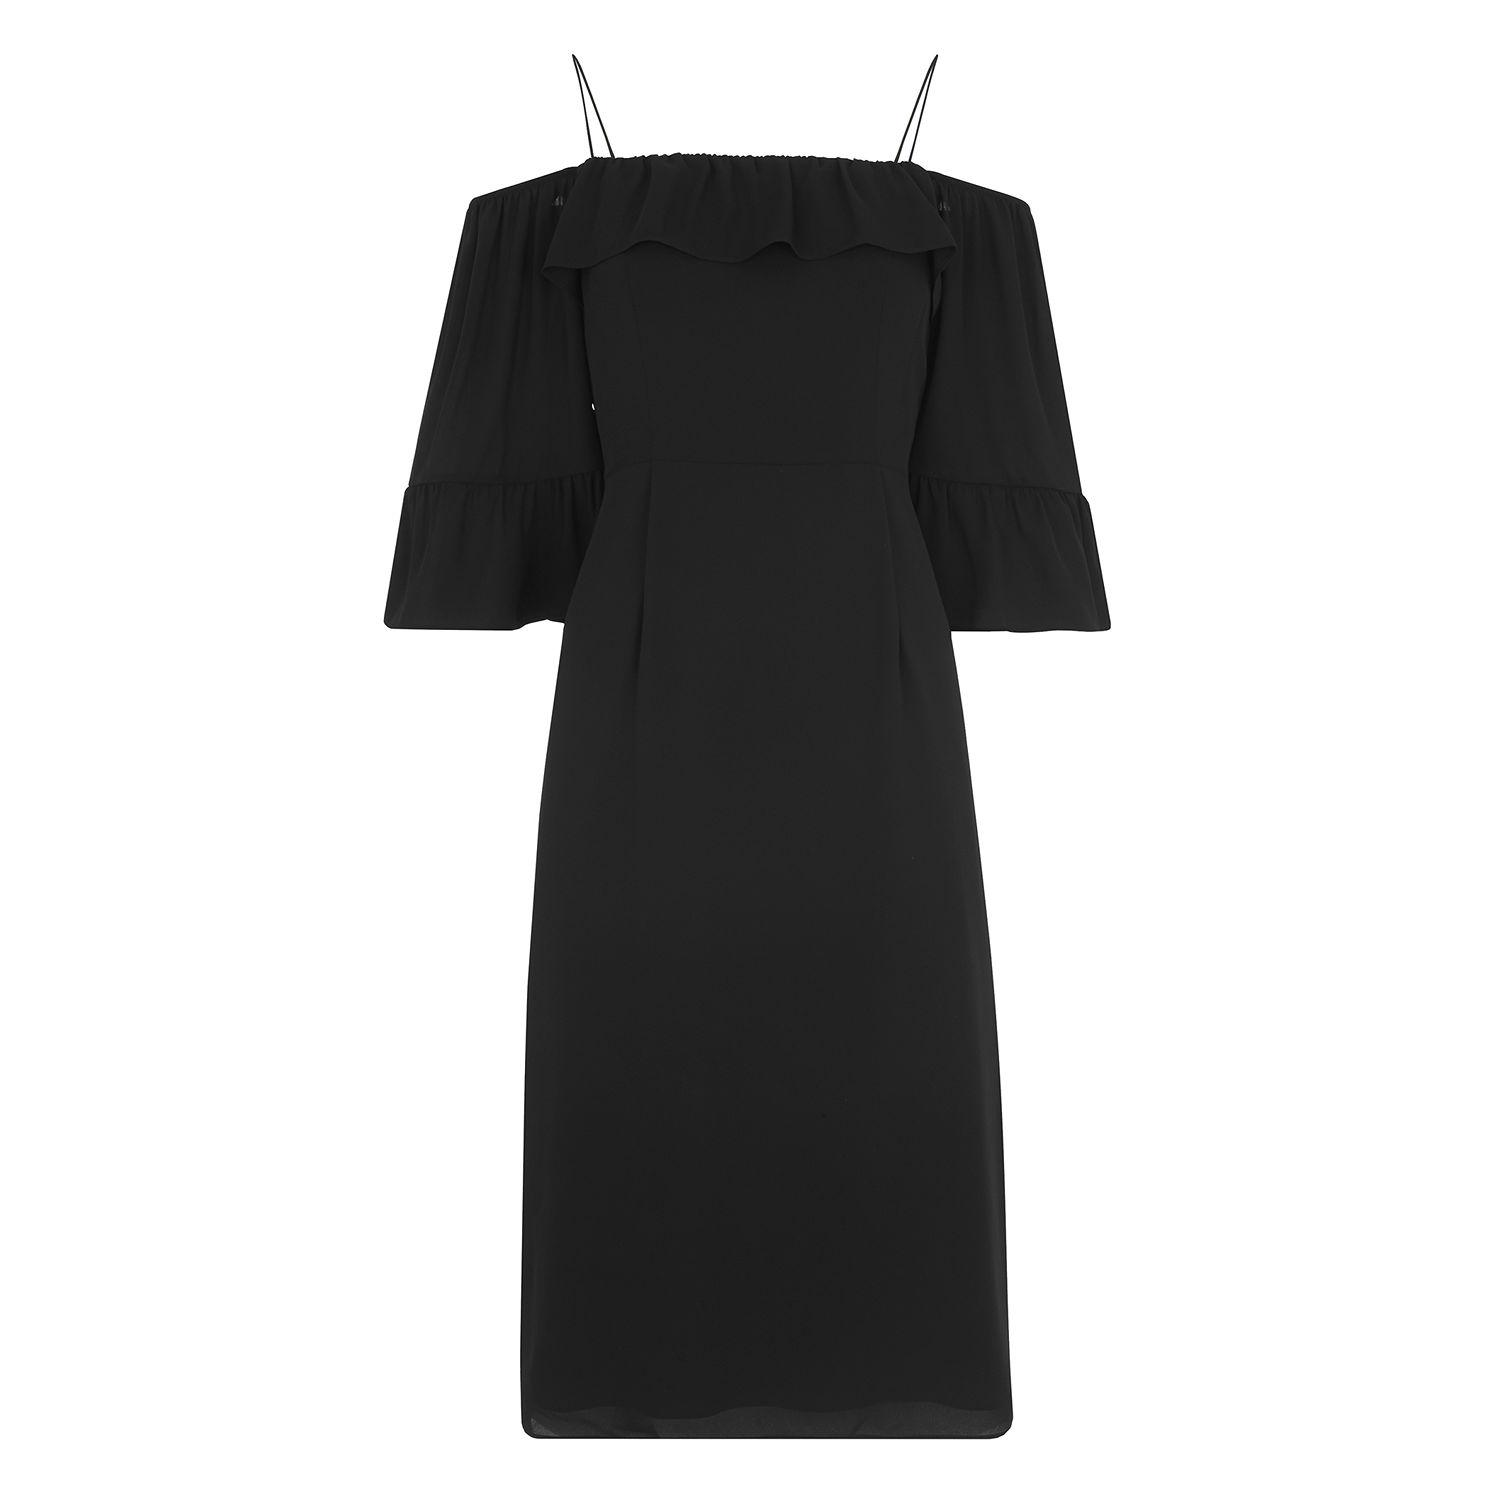 09e7b0c86845 Whistles - Black Off Shoulder Frill Dress - Lyst. View fullscreen